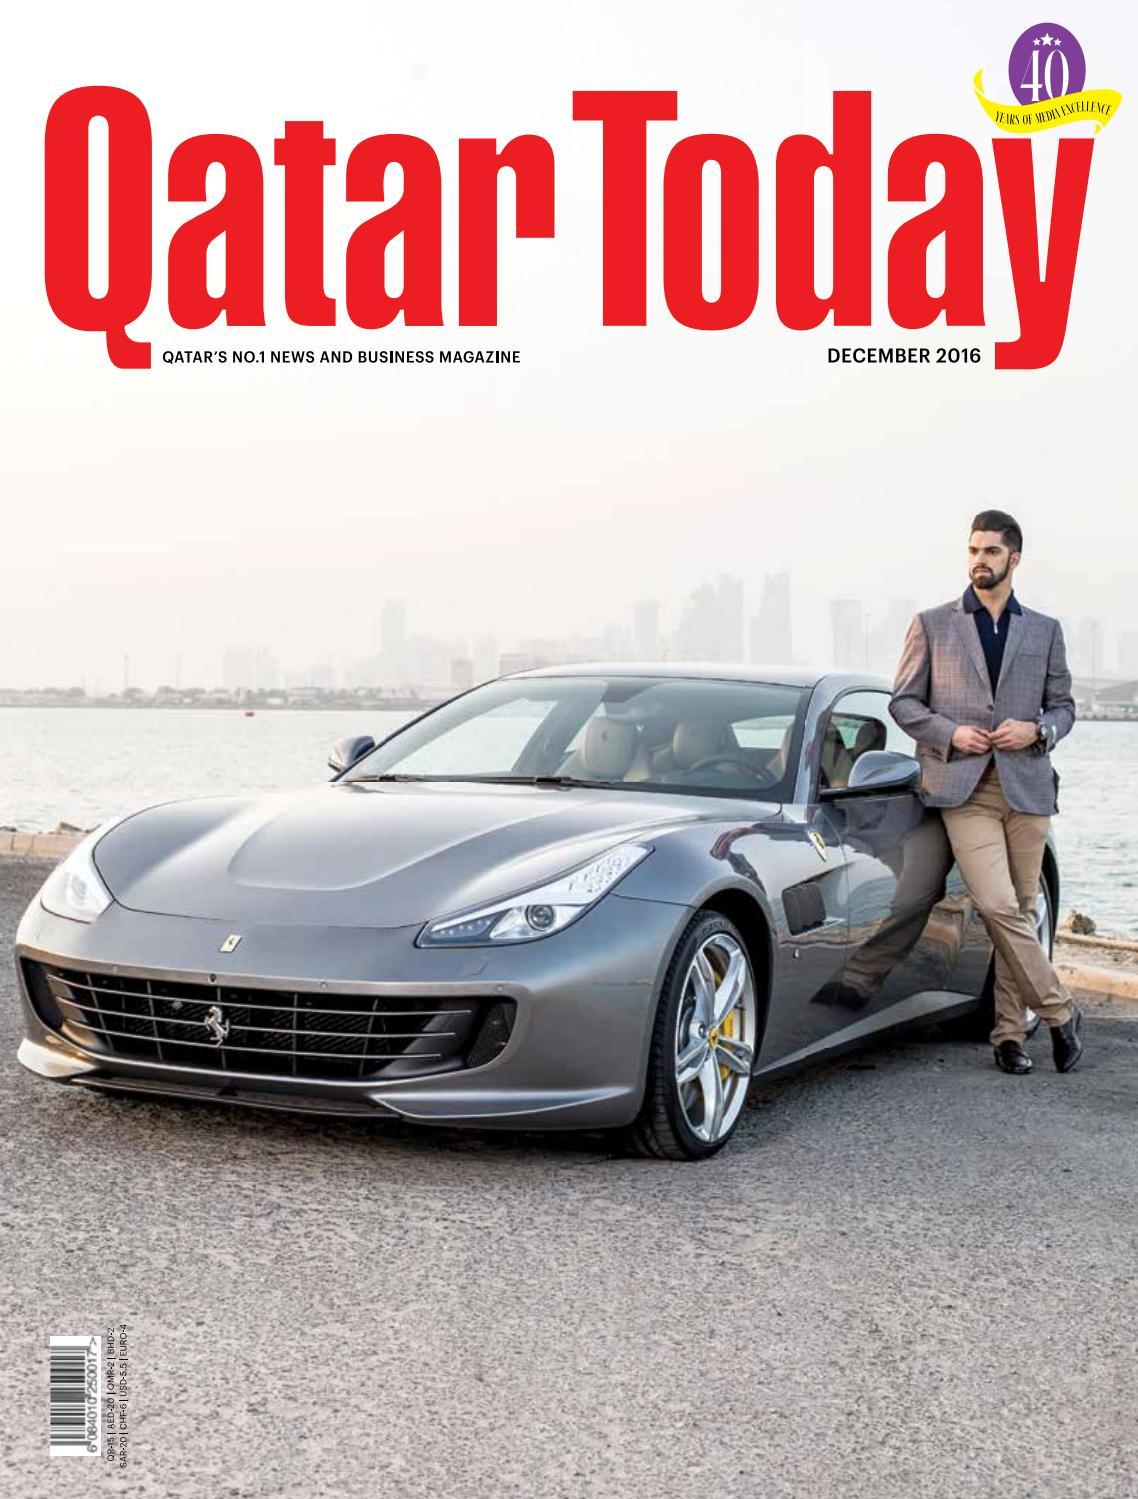 Qatar Today December 2016